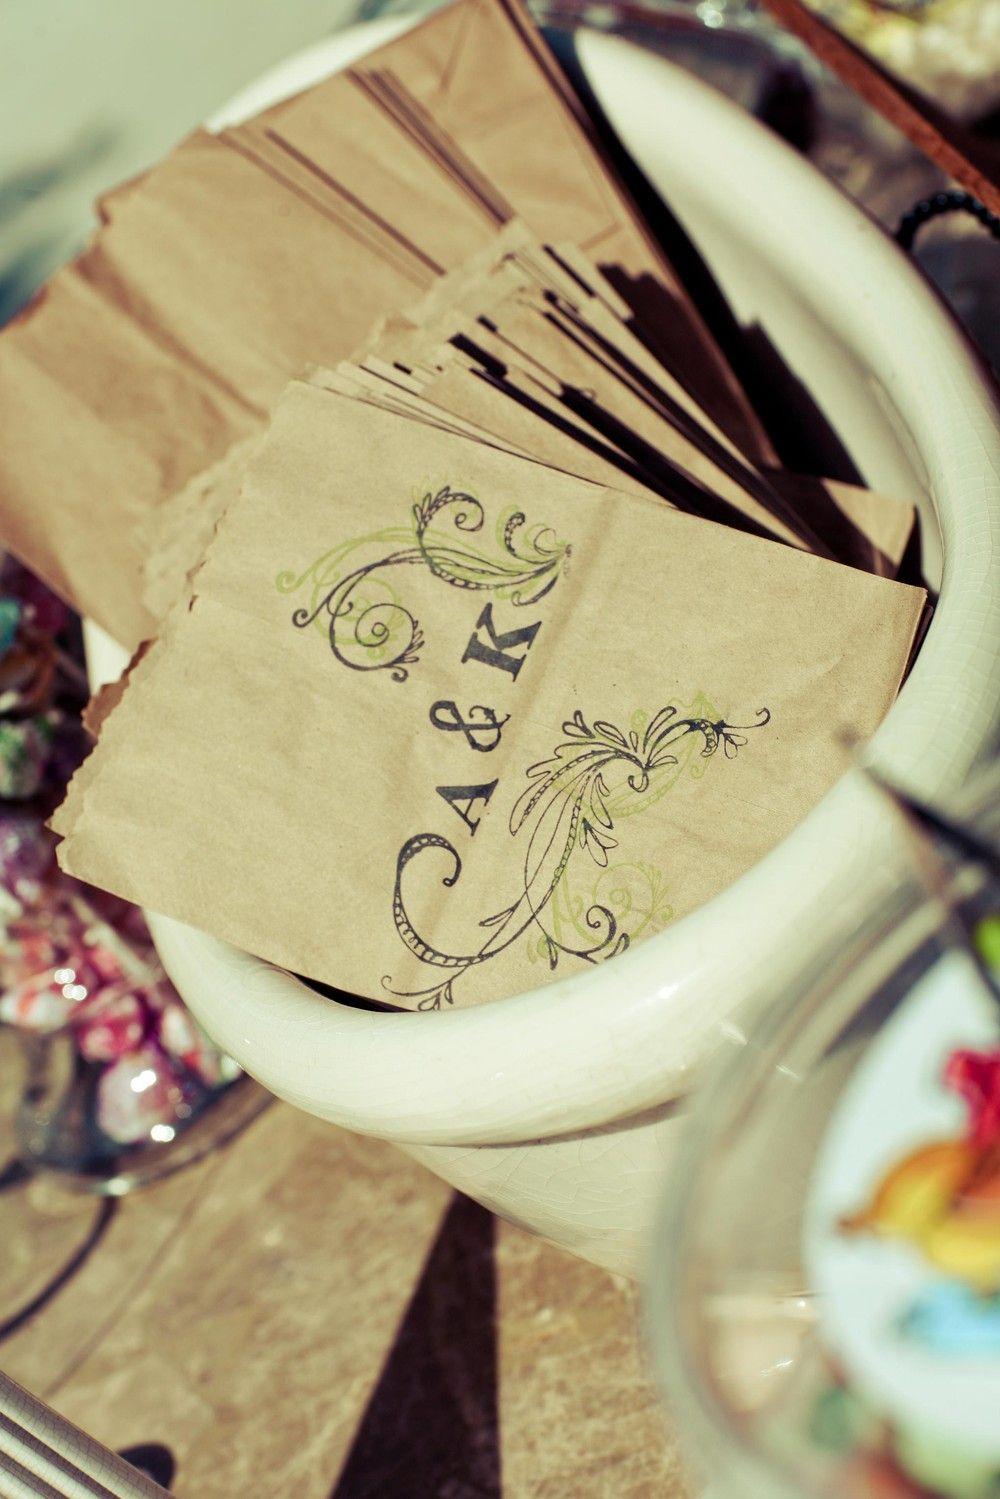 SAMPLE Wedding Favor Candy Bag. Custom. Rustic Chic. Hand